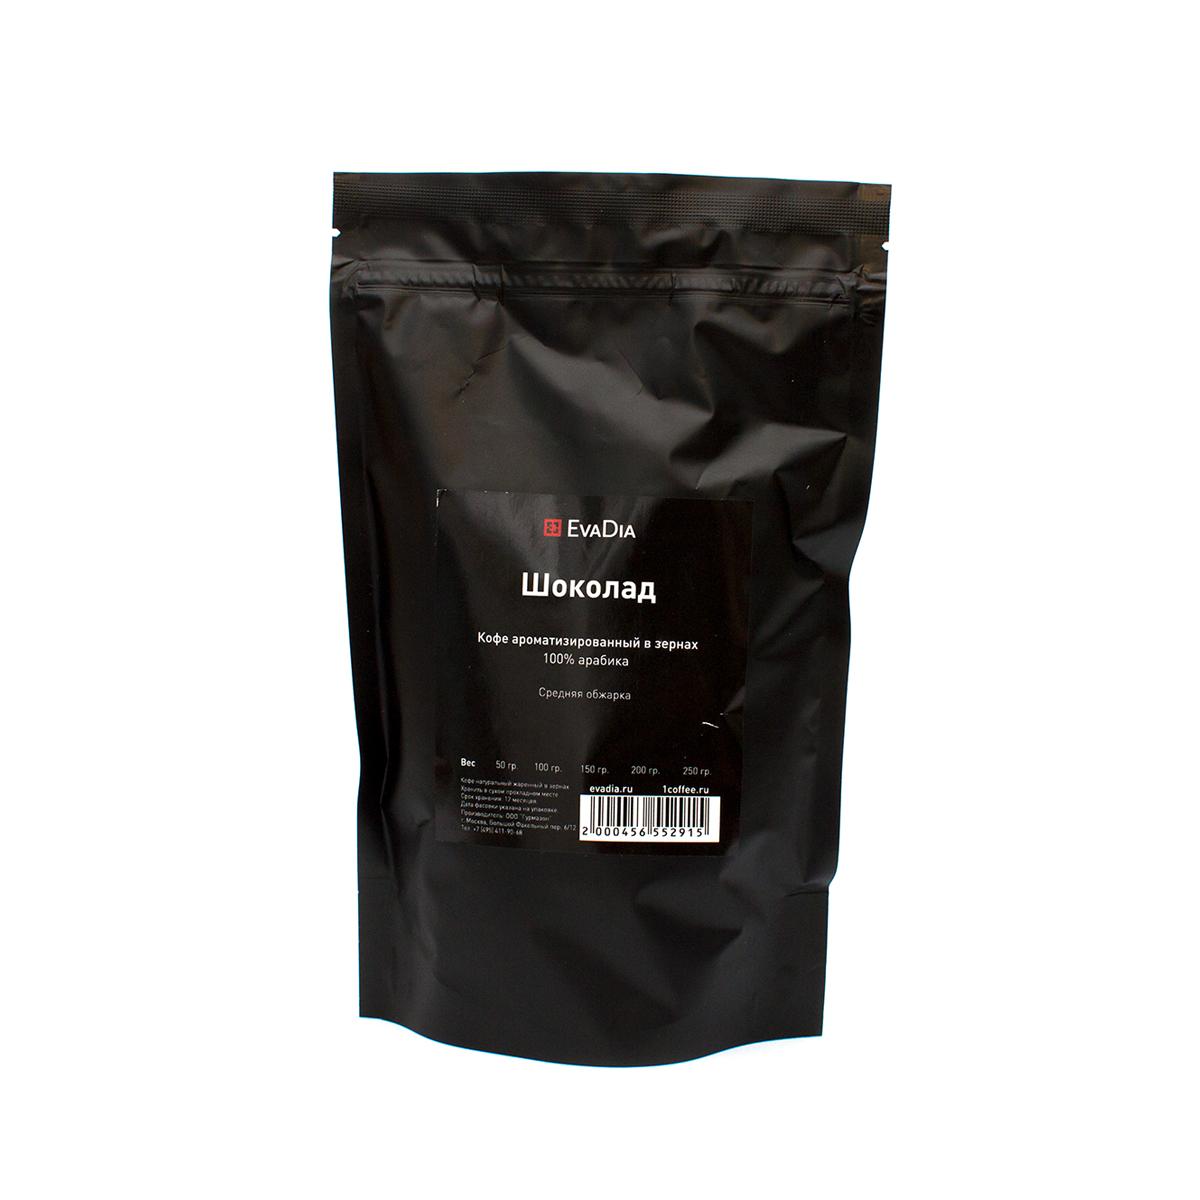 Кофе EvaDia «Шоколад» 100% arabica, 250 грамм